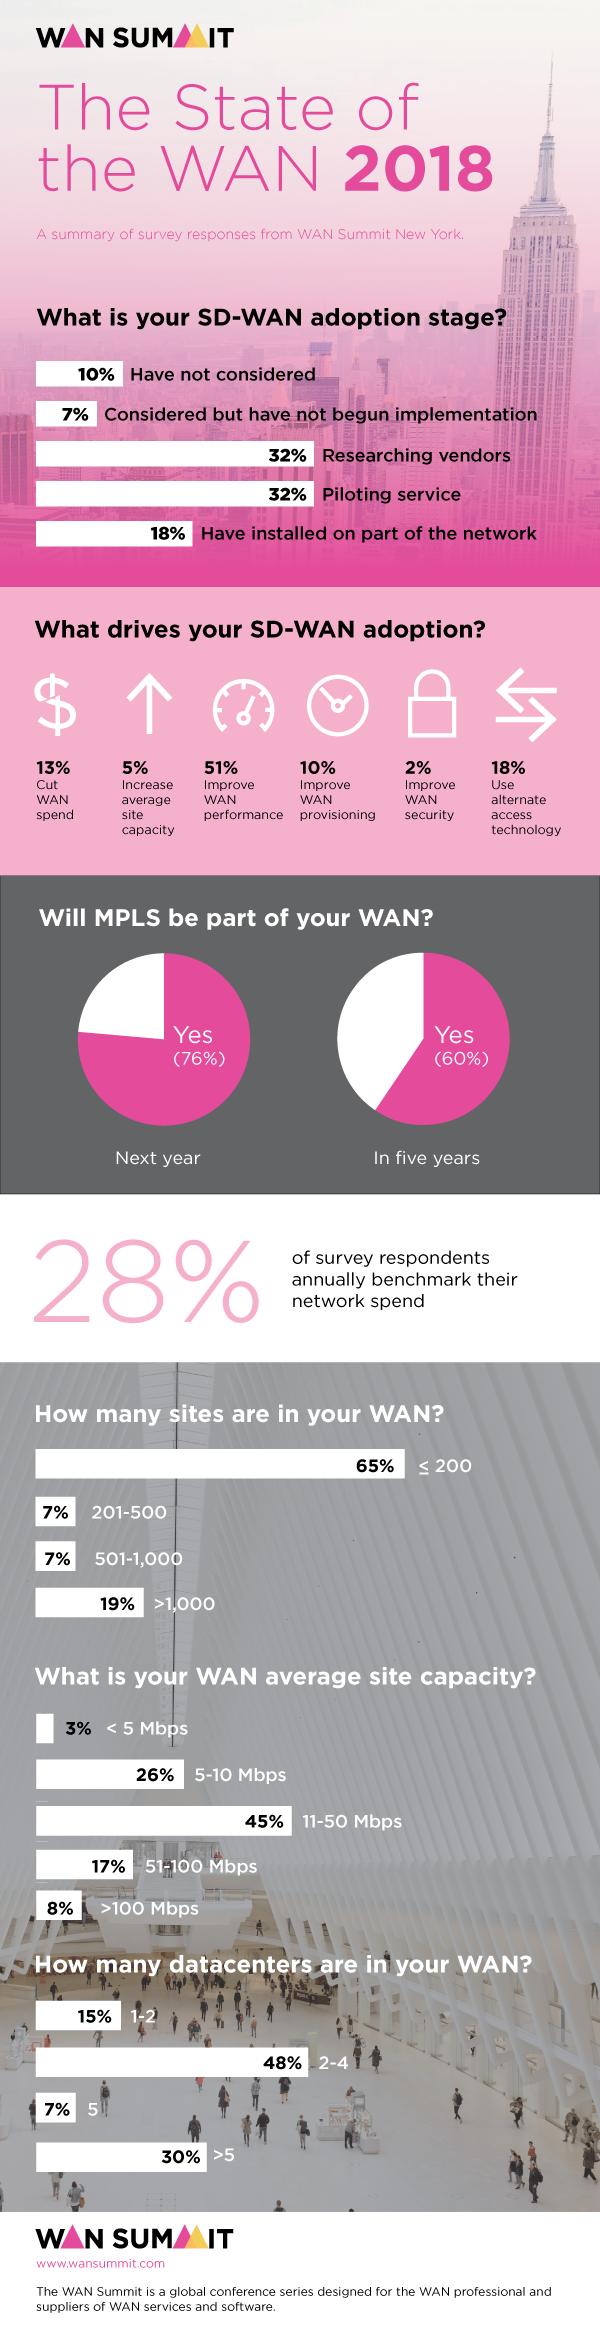 wsnyc18-infographic